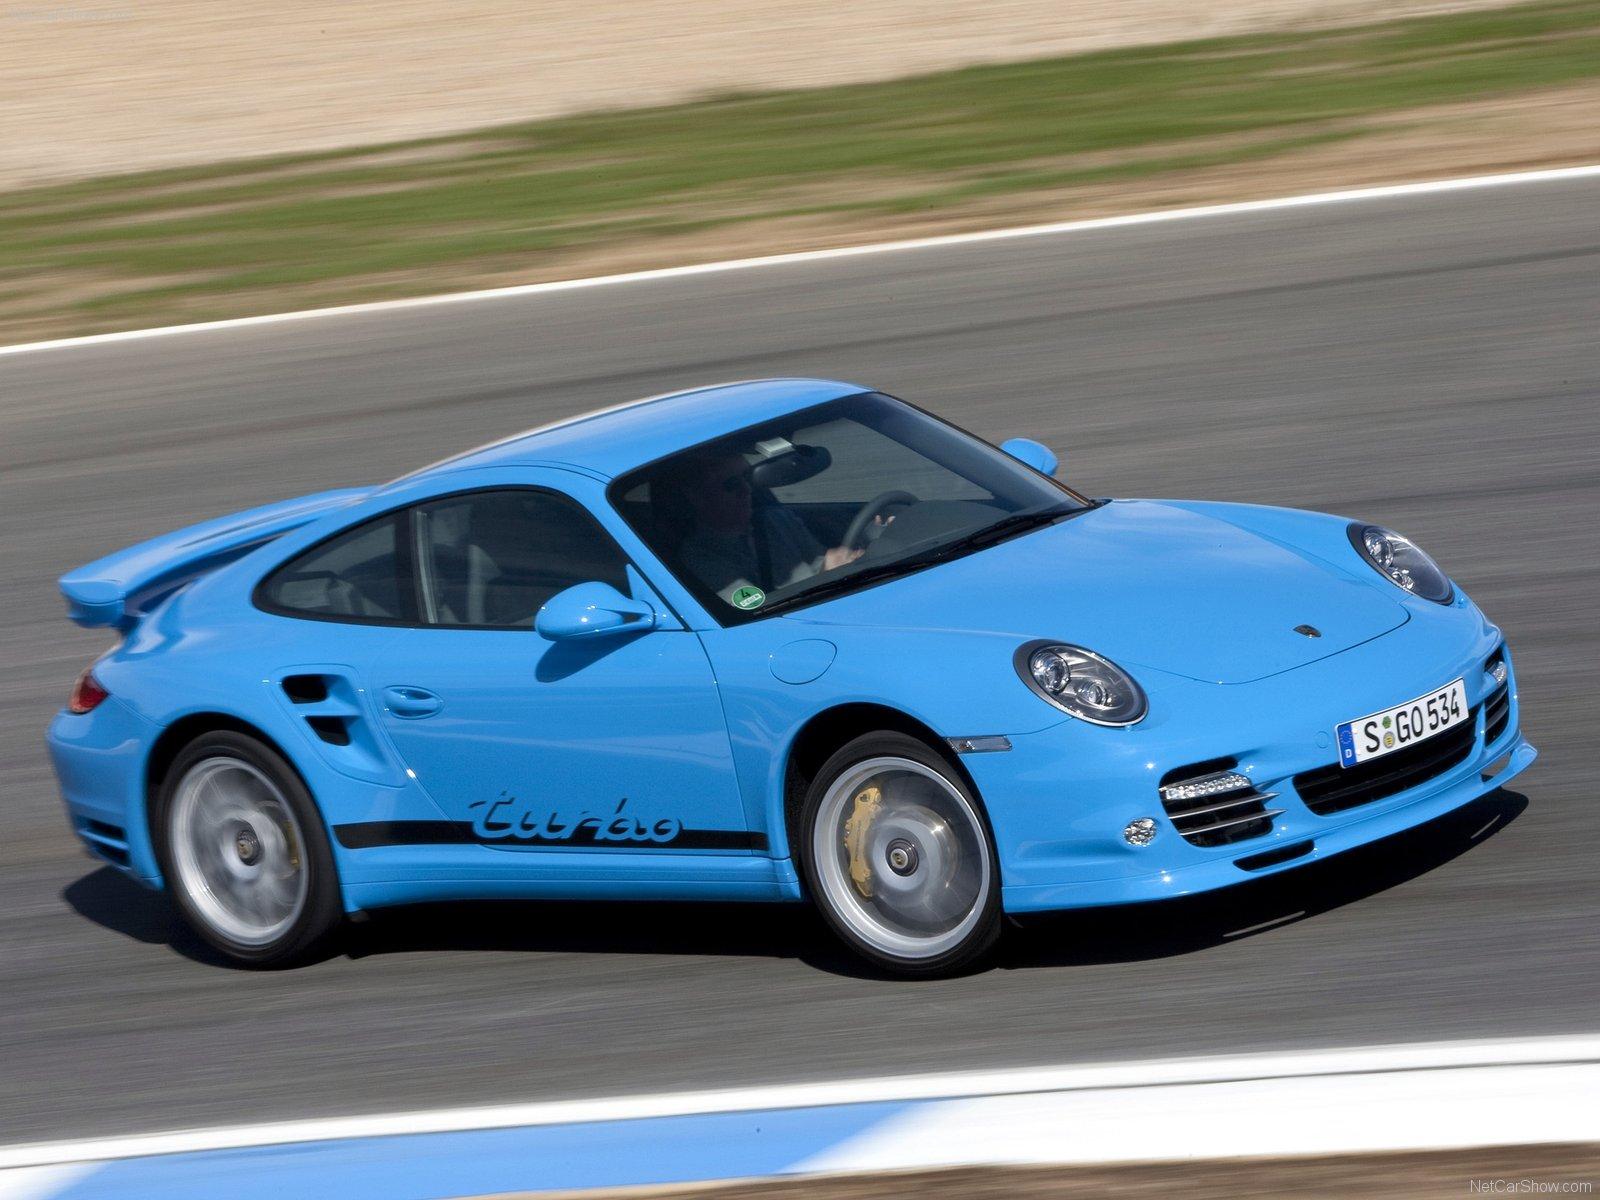 2010 Blue Porsche 911 Turbo Wallpapers